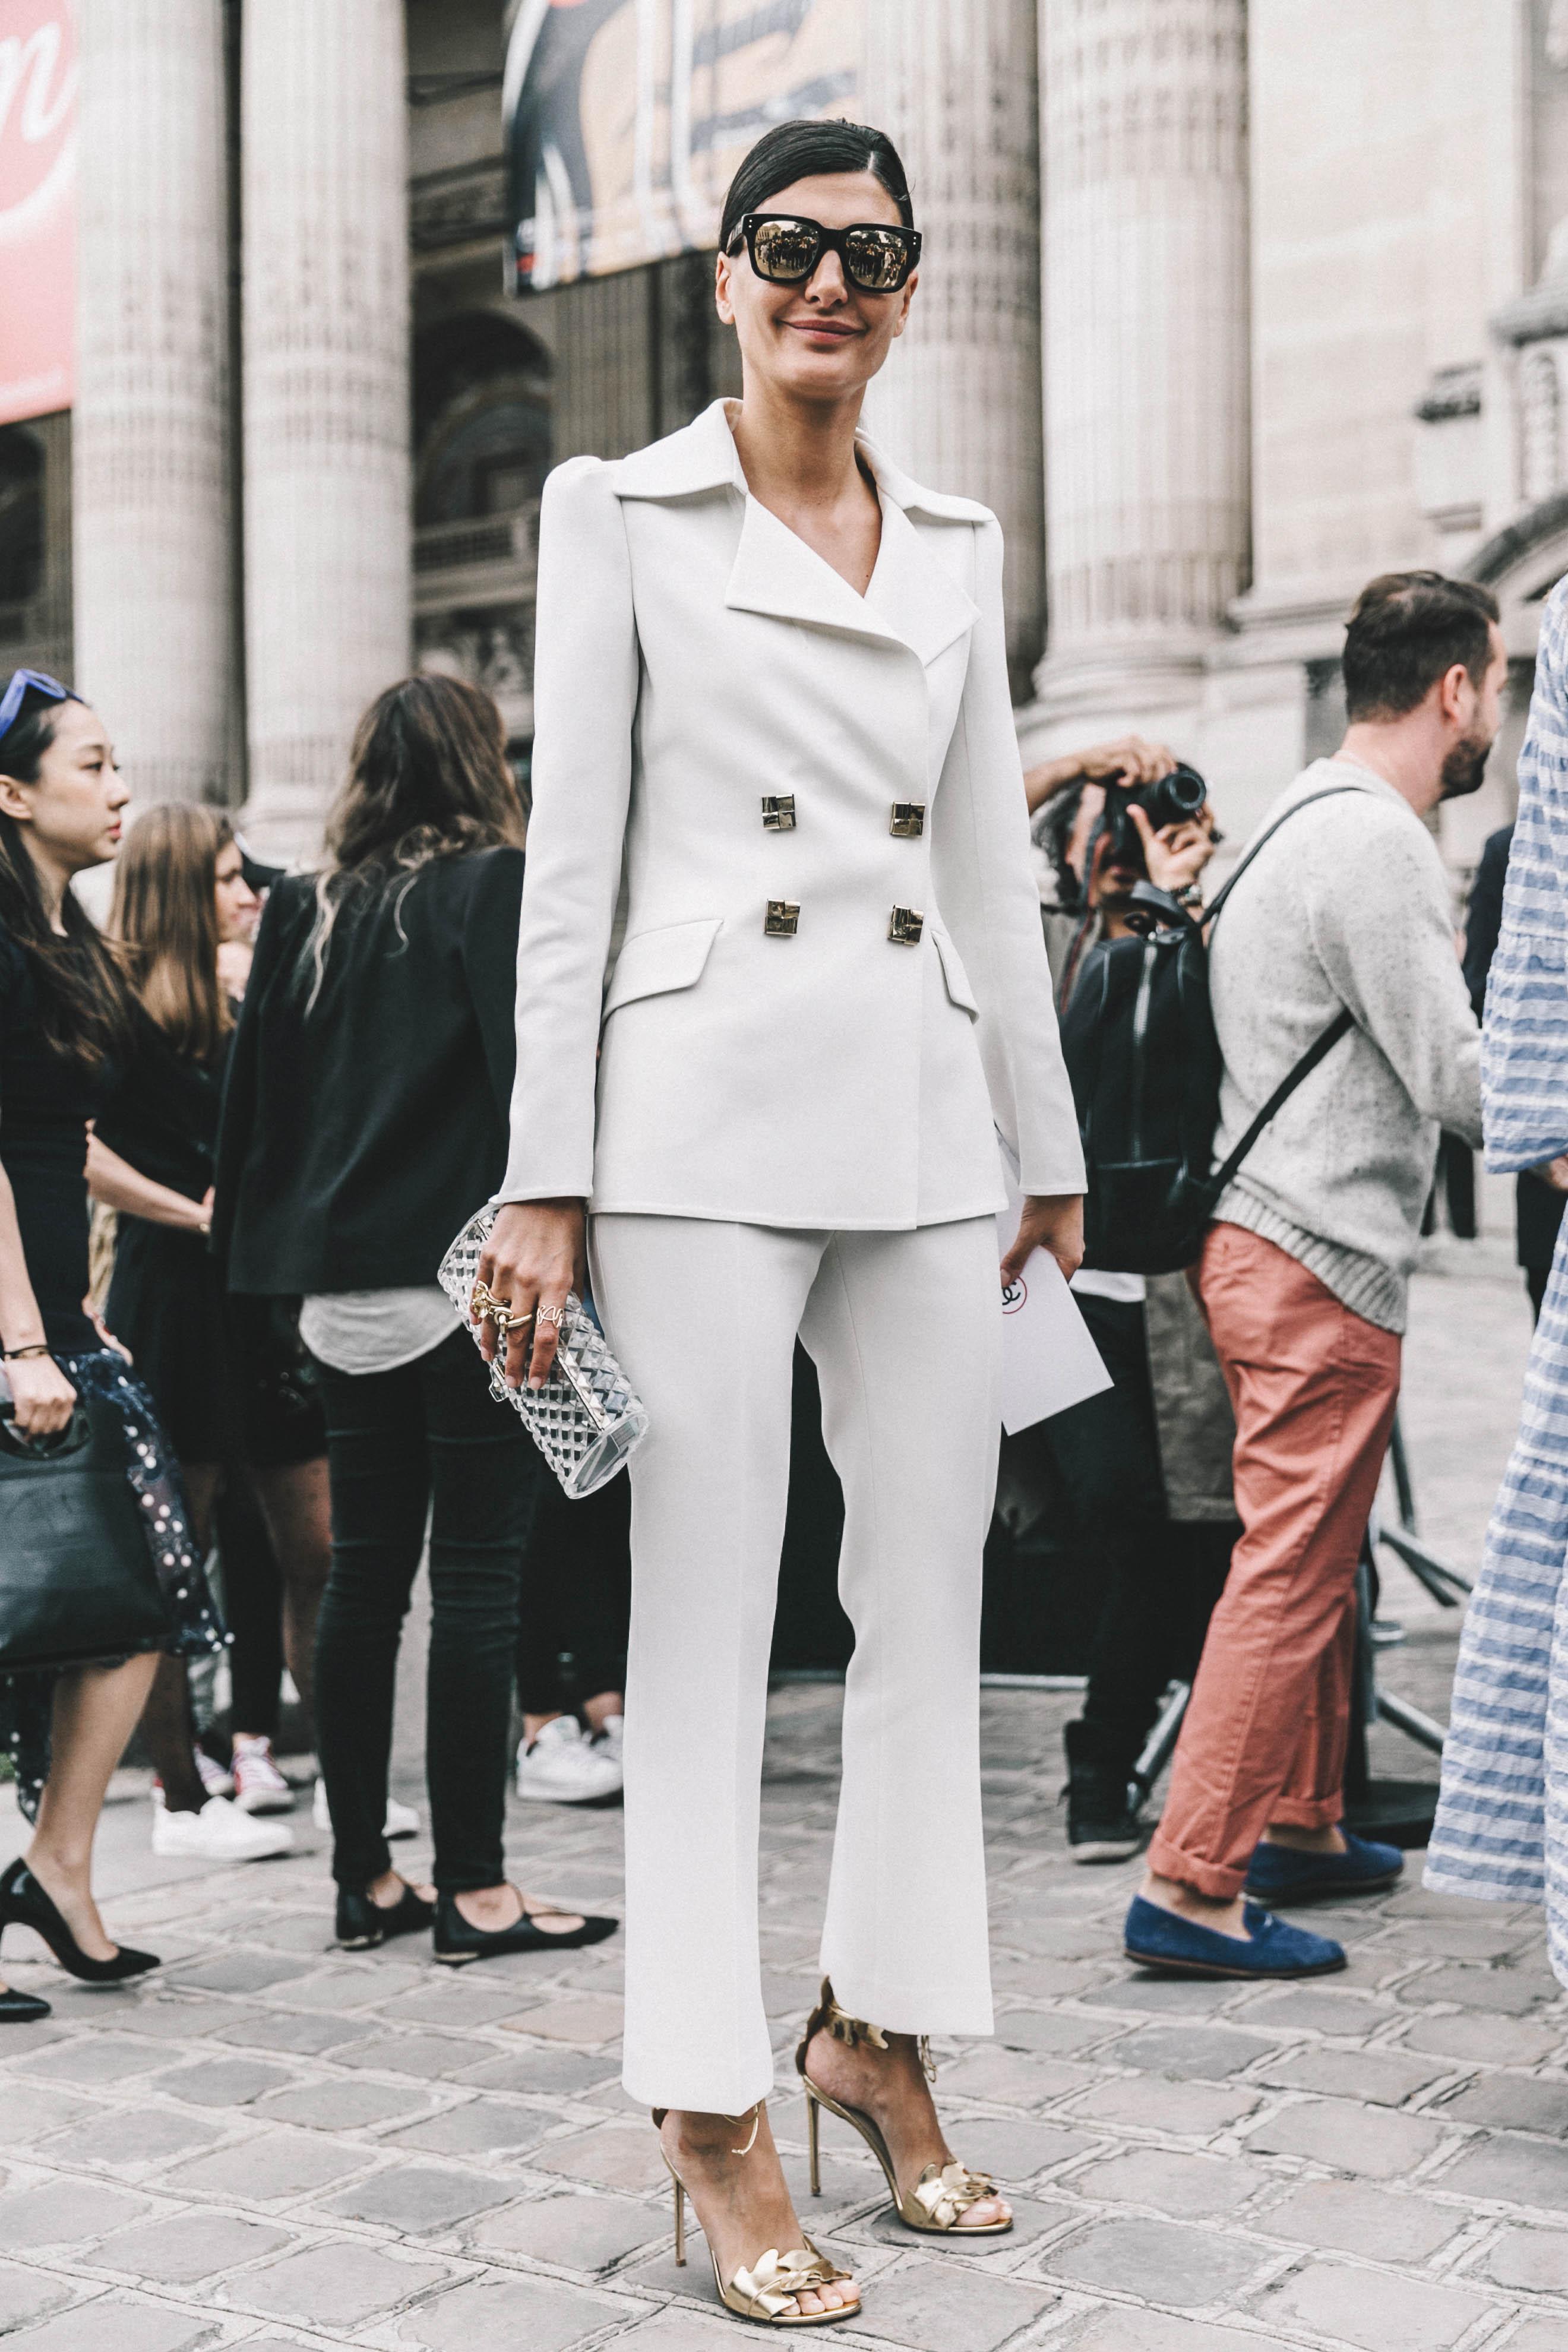 paris_couture_fashion_week-collage_vintage-65